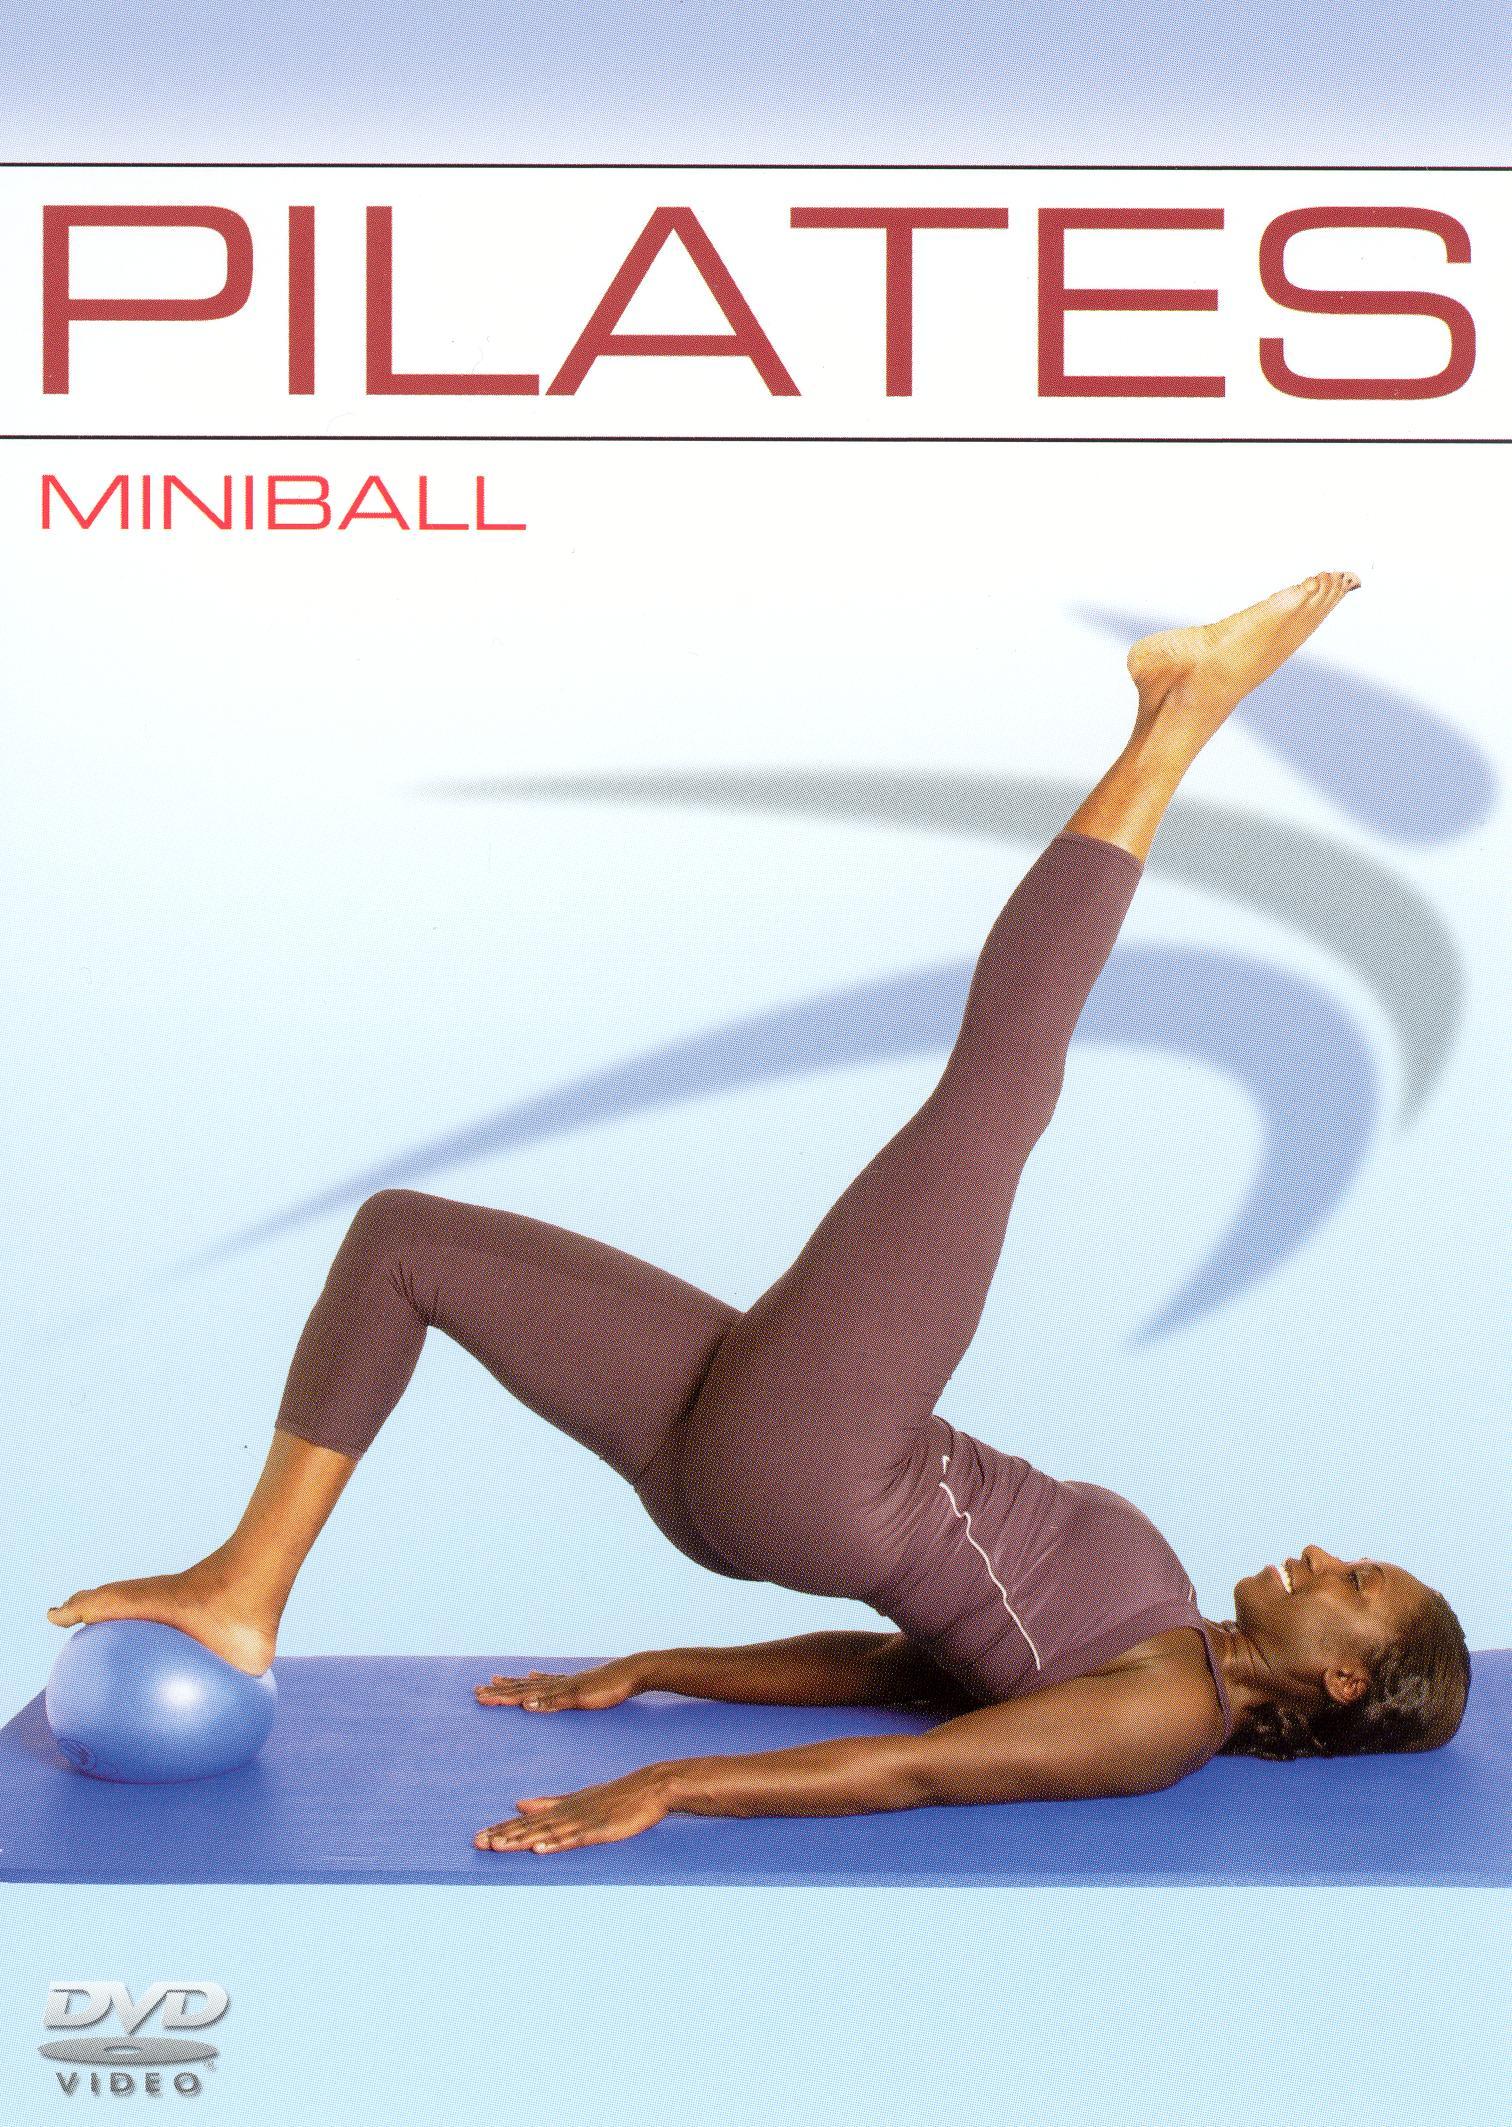 Juliana Afram: Pilates - Miniball